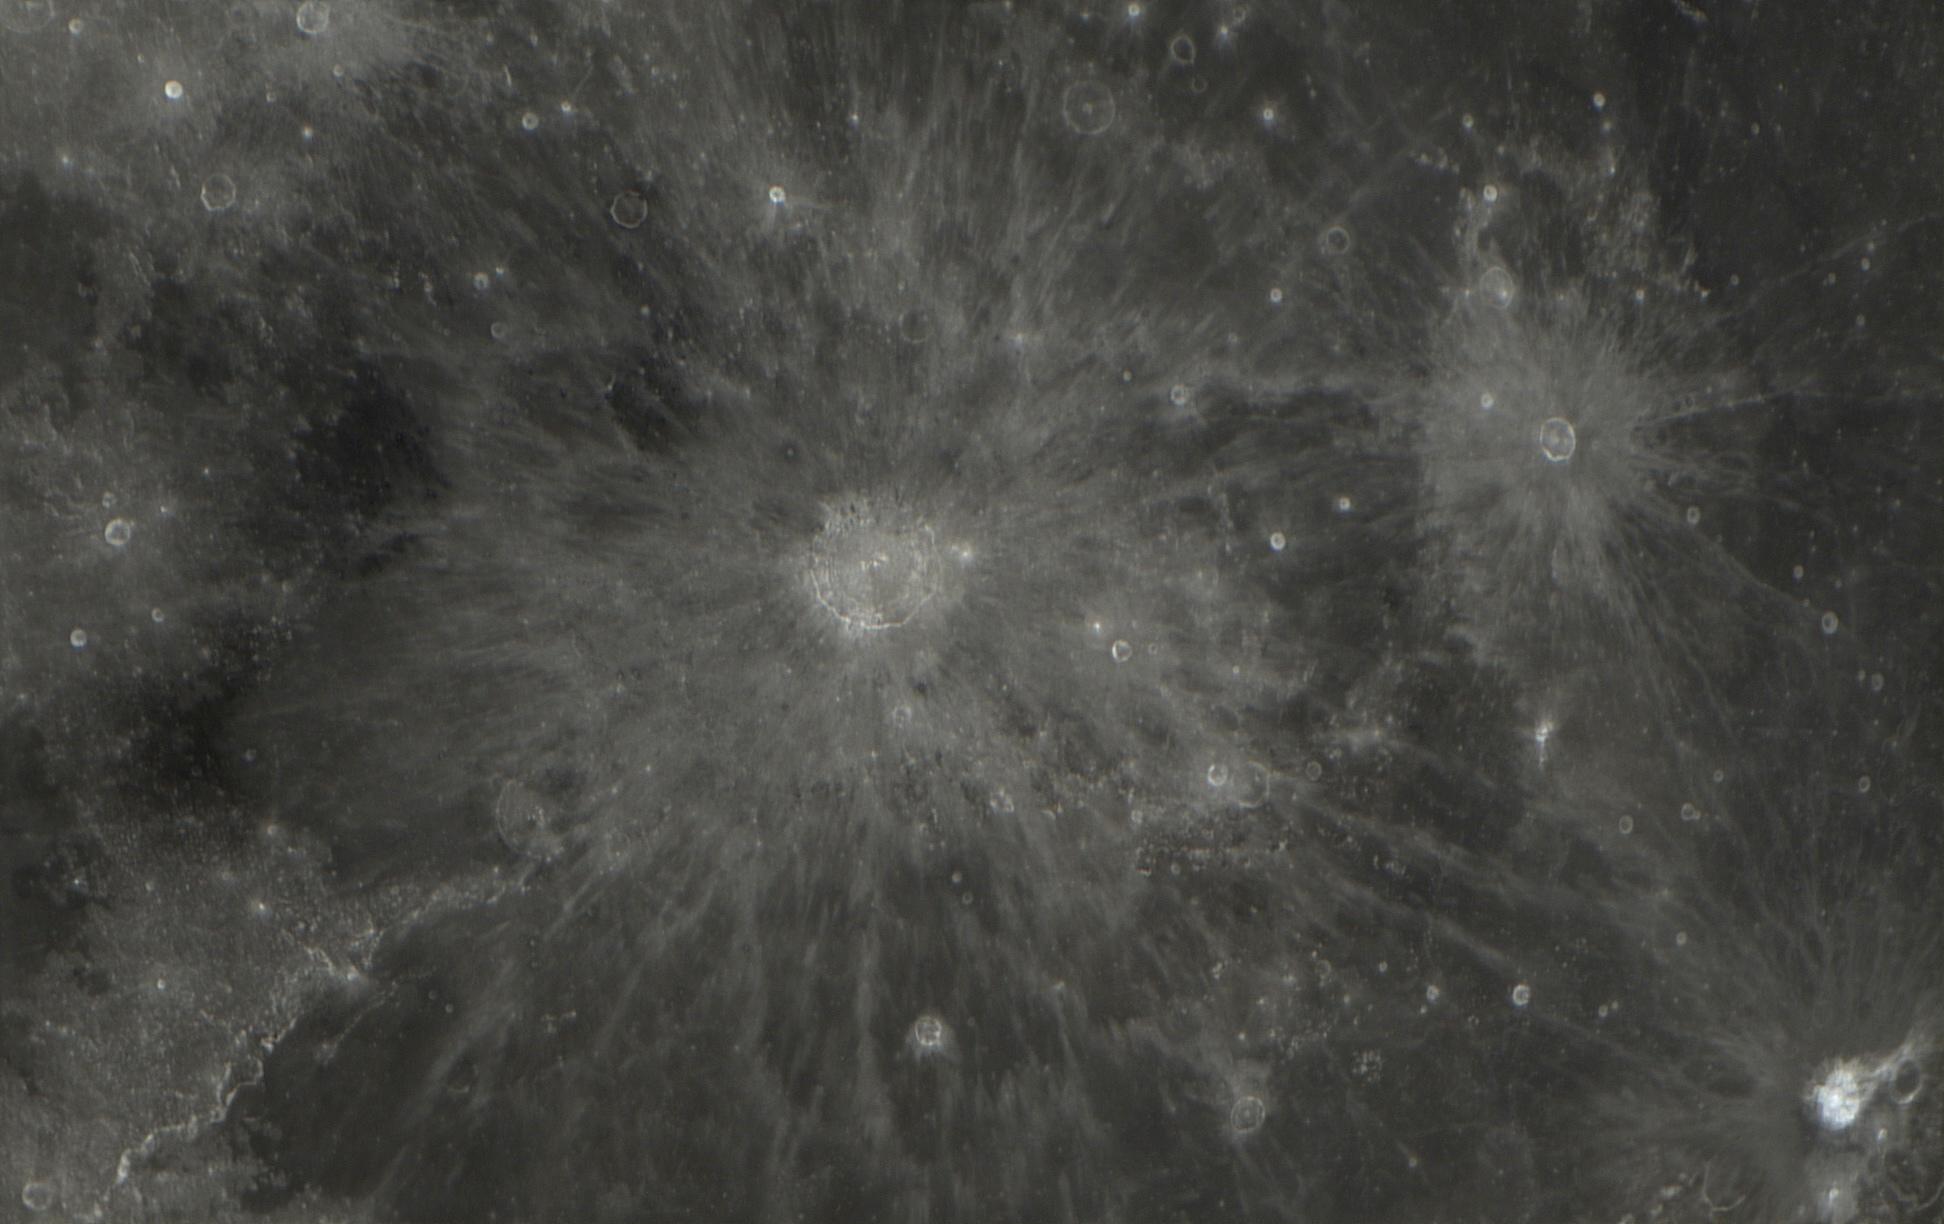 2019-09-16_T_00-52-15-0833_Copernic2.jpg.18a769d766af3c474821e0b6d829fa0e.jpg